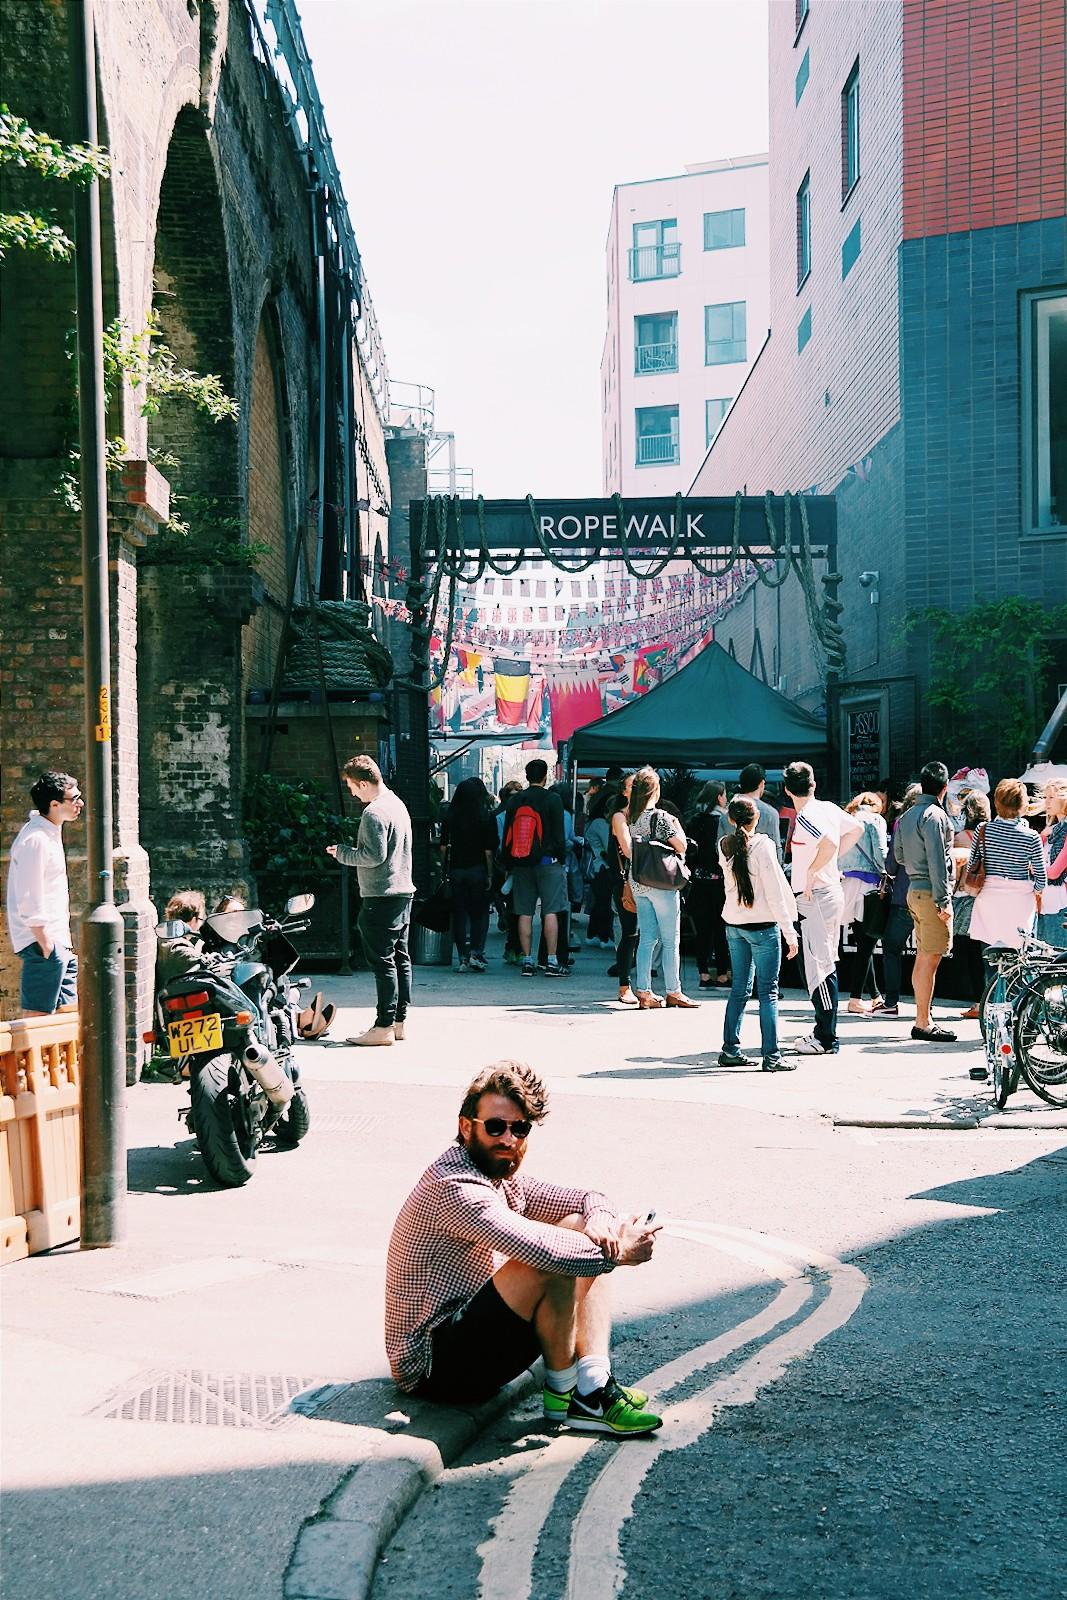 Maltby-Street-Market-Ropewalk-entrance-Bermondsey-London-street-food-entrée-marché-gourmand-Londres-photo-by-united-states-of-paris-blog